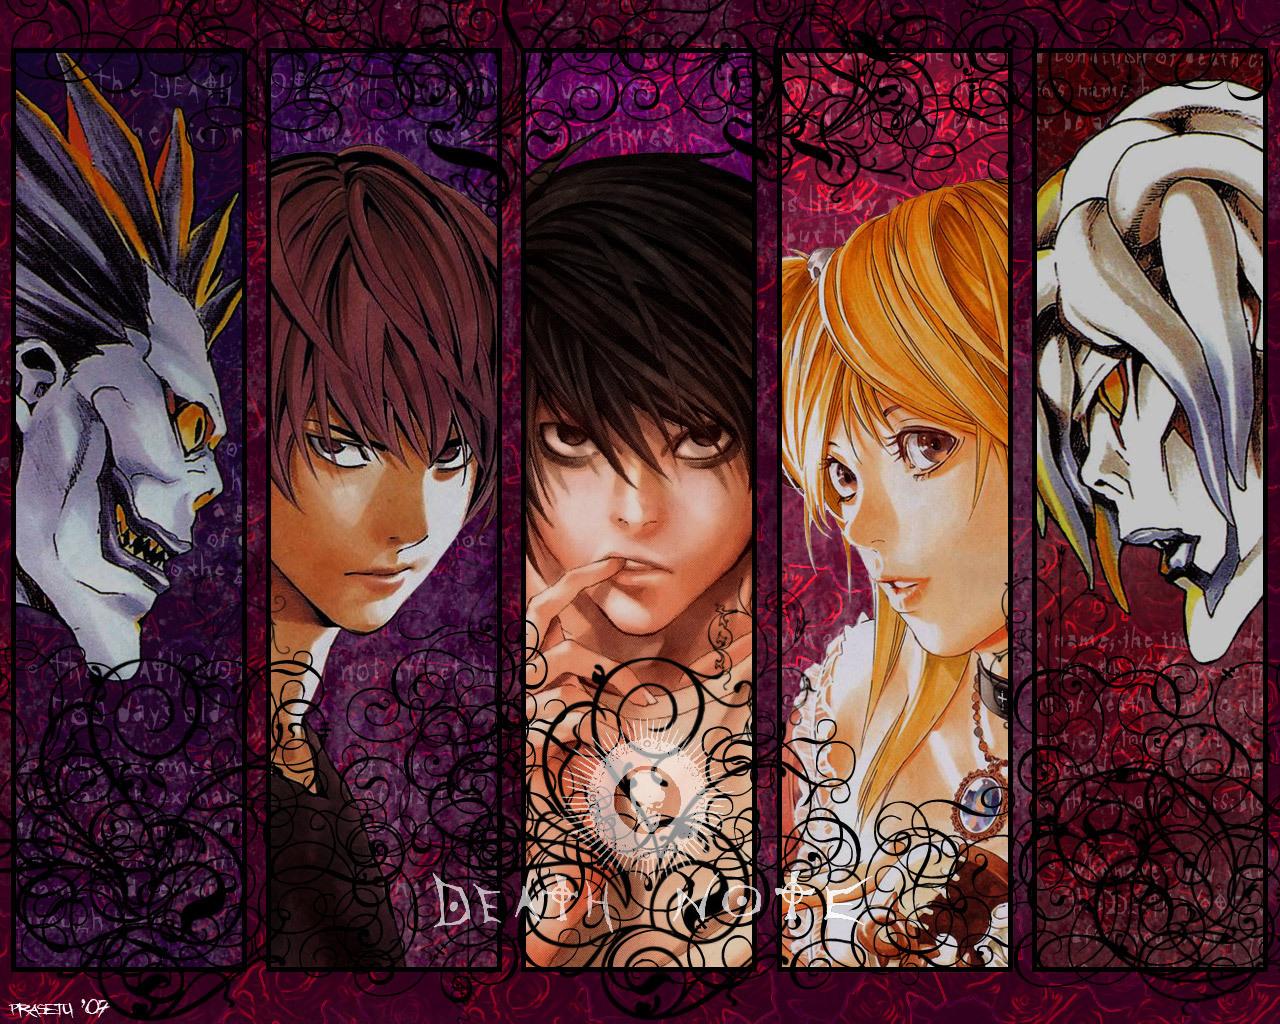 Od lewej: Ryūk, Light Yagami, L, Misa Amane, Rem: manga-and-anime-forever.blogspot.com/2013/05/death-note-anime.html